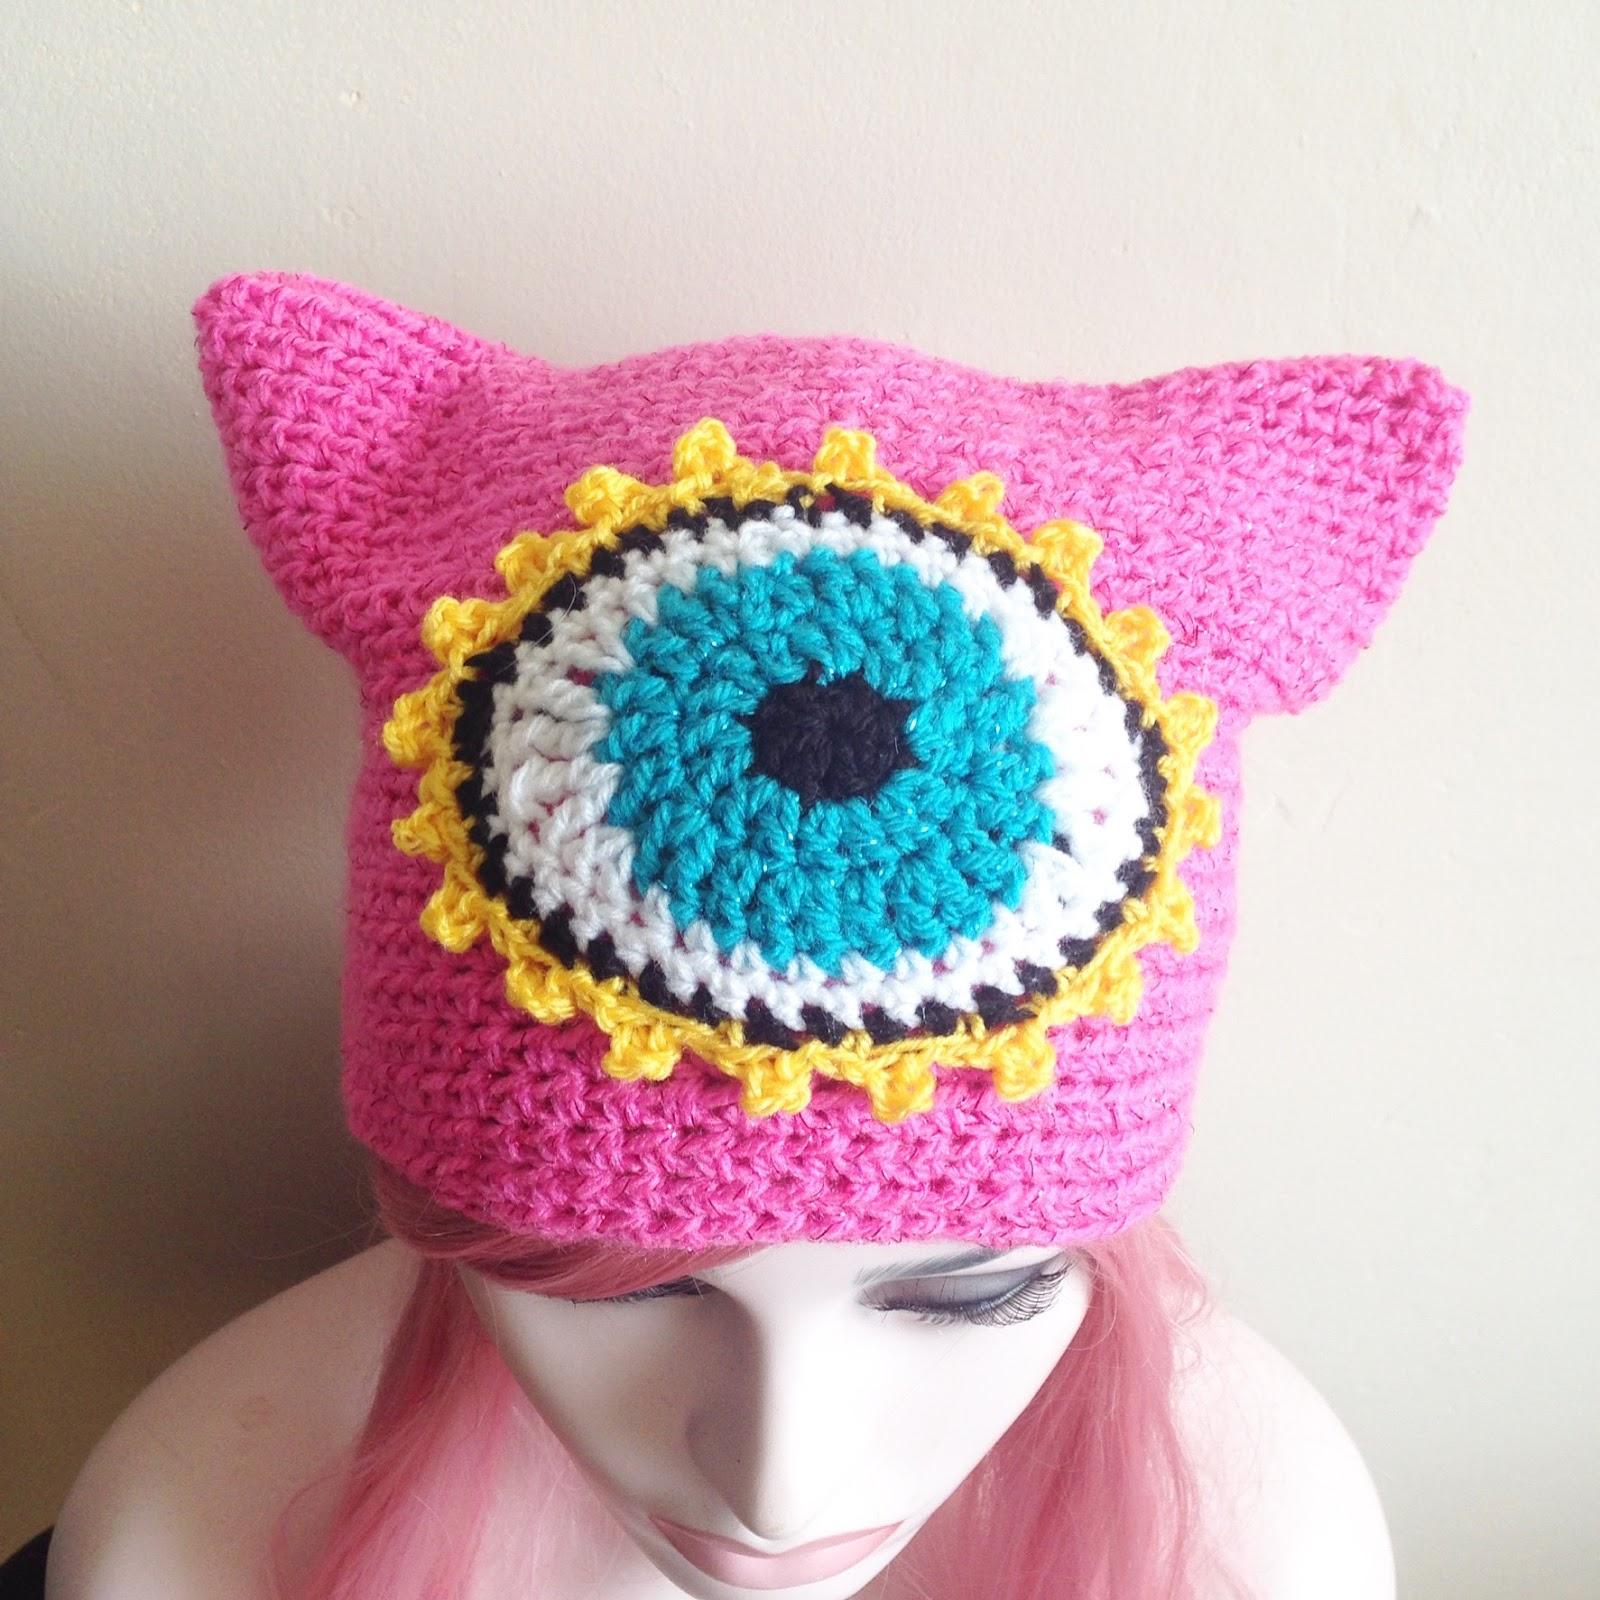 Crochet Patterns Galore - Third Eye Kitty Beanie